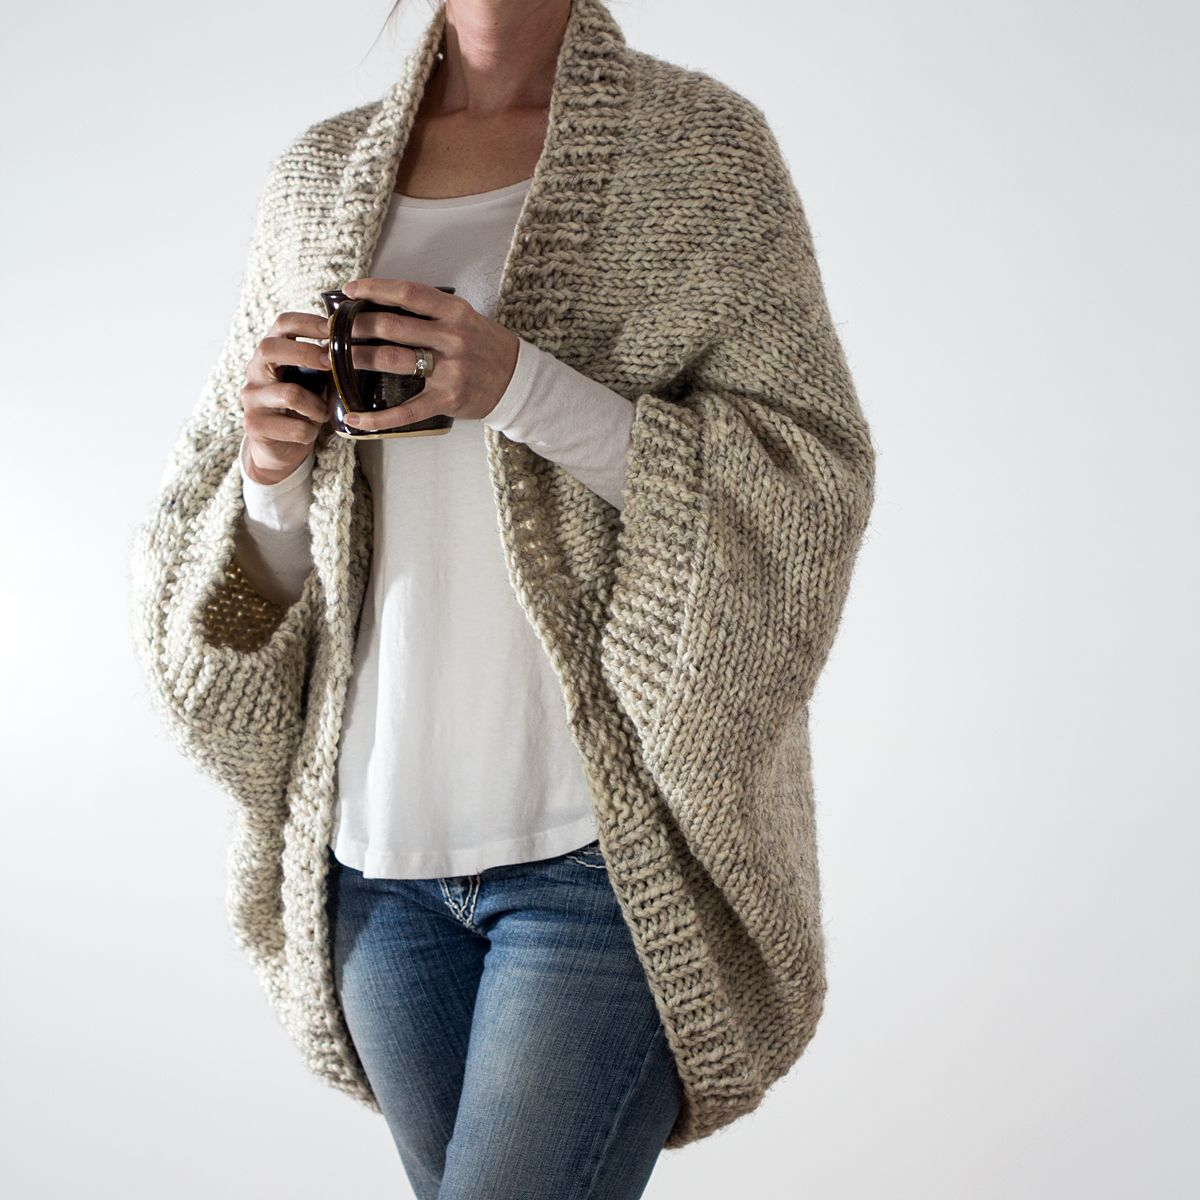 Oversized Scoop Sweater Knitting Pattern | Crochet & Knitting ...